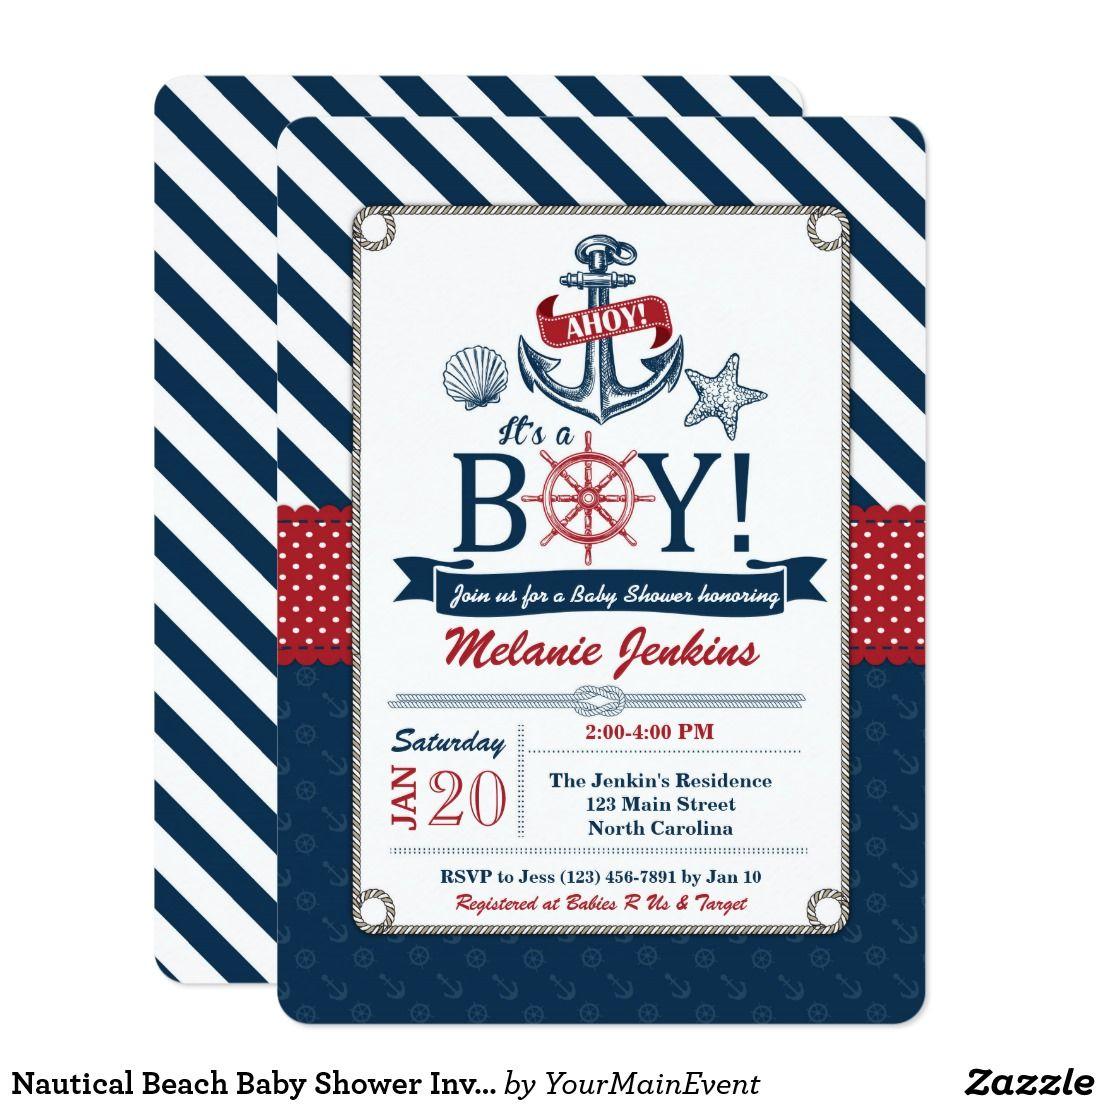 Nautical Beach Baby Shower Invitation Ahoy it\'s a boy! This navy ...